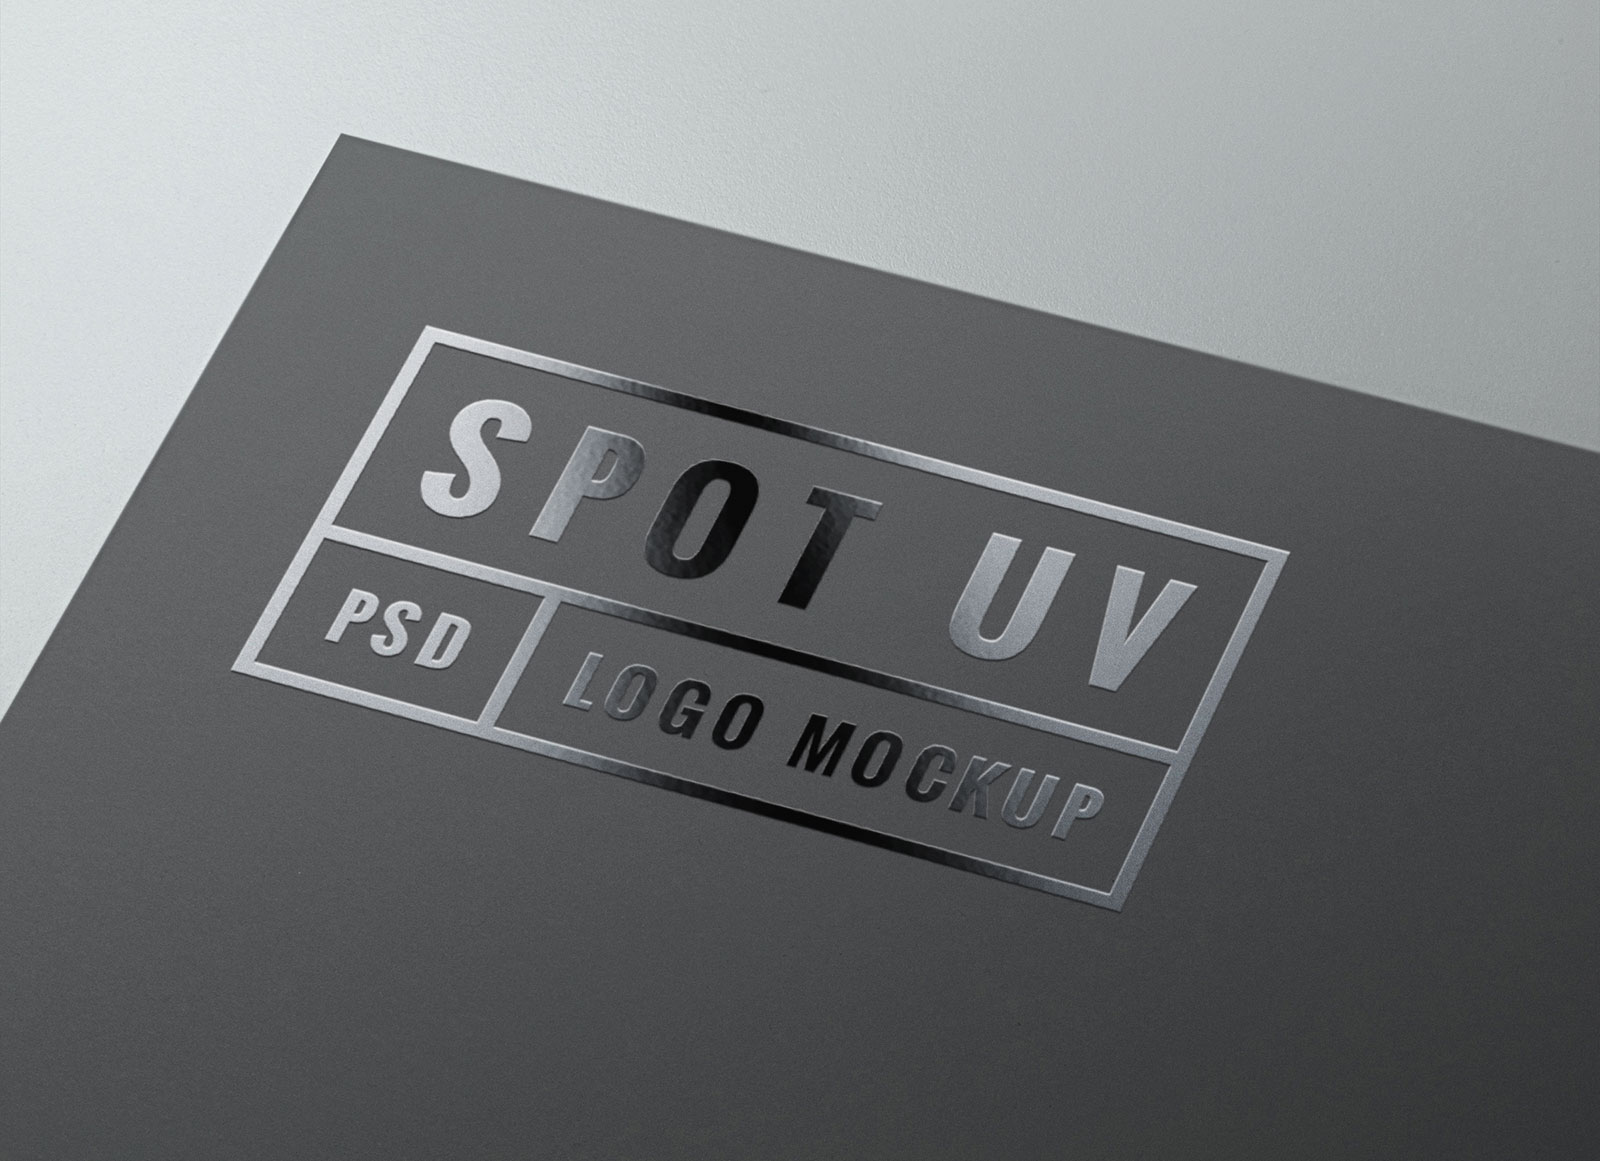 Free-Spot-UV-Logo-Mockup-PSD